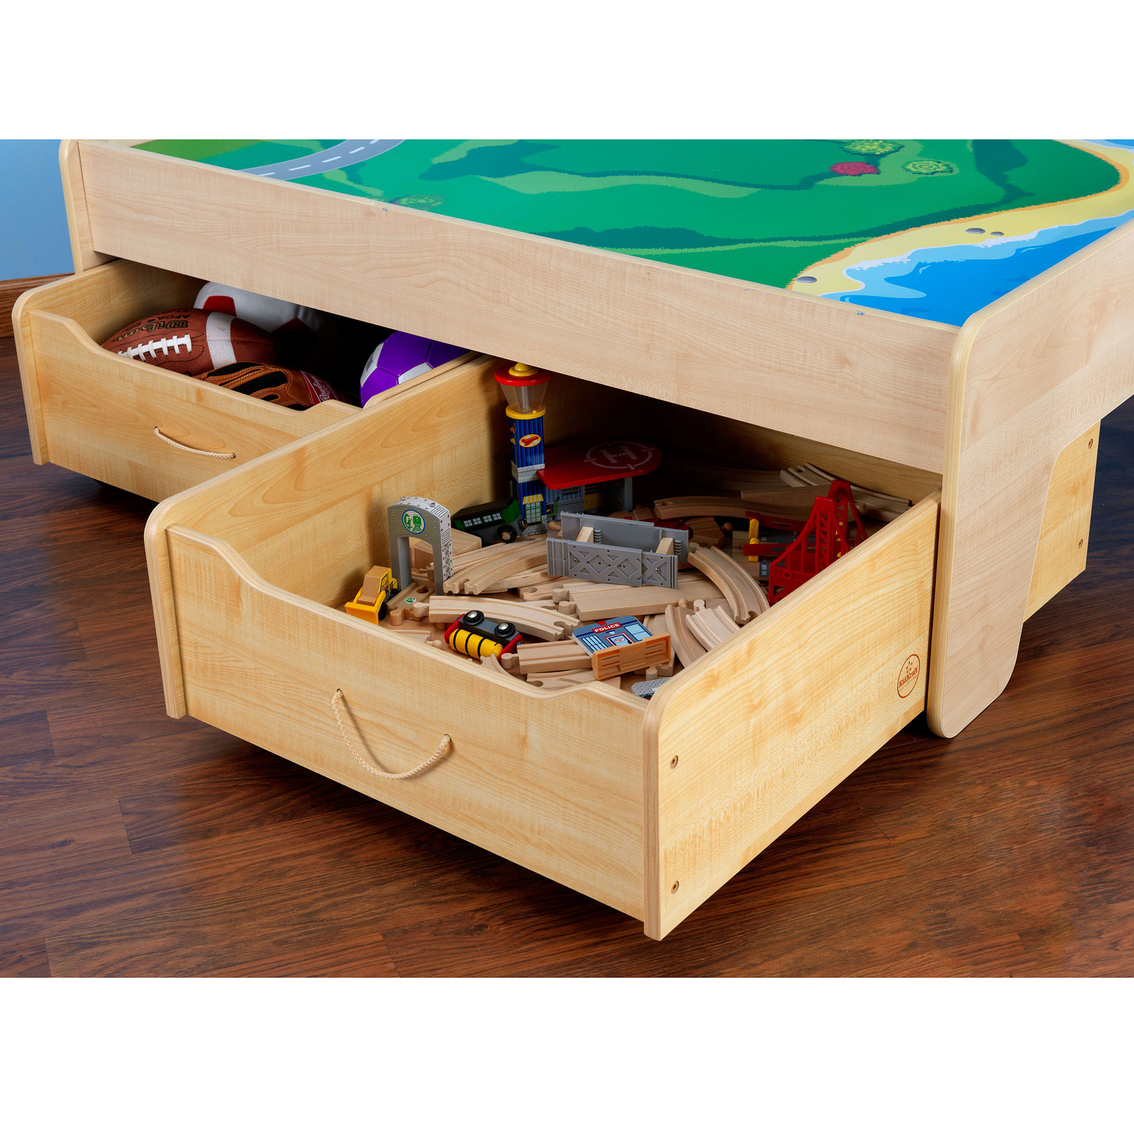 Kidkraft trundle drawer for train table dressers for Table kidkraft